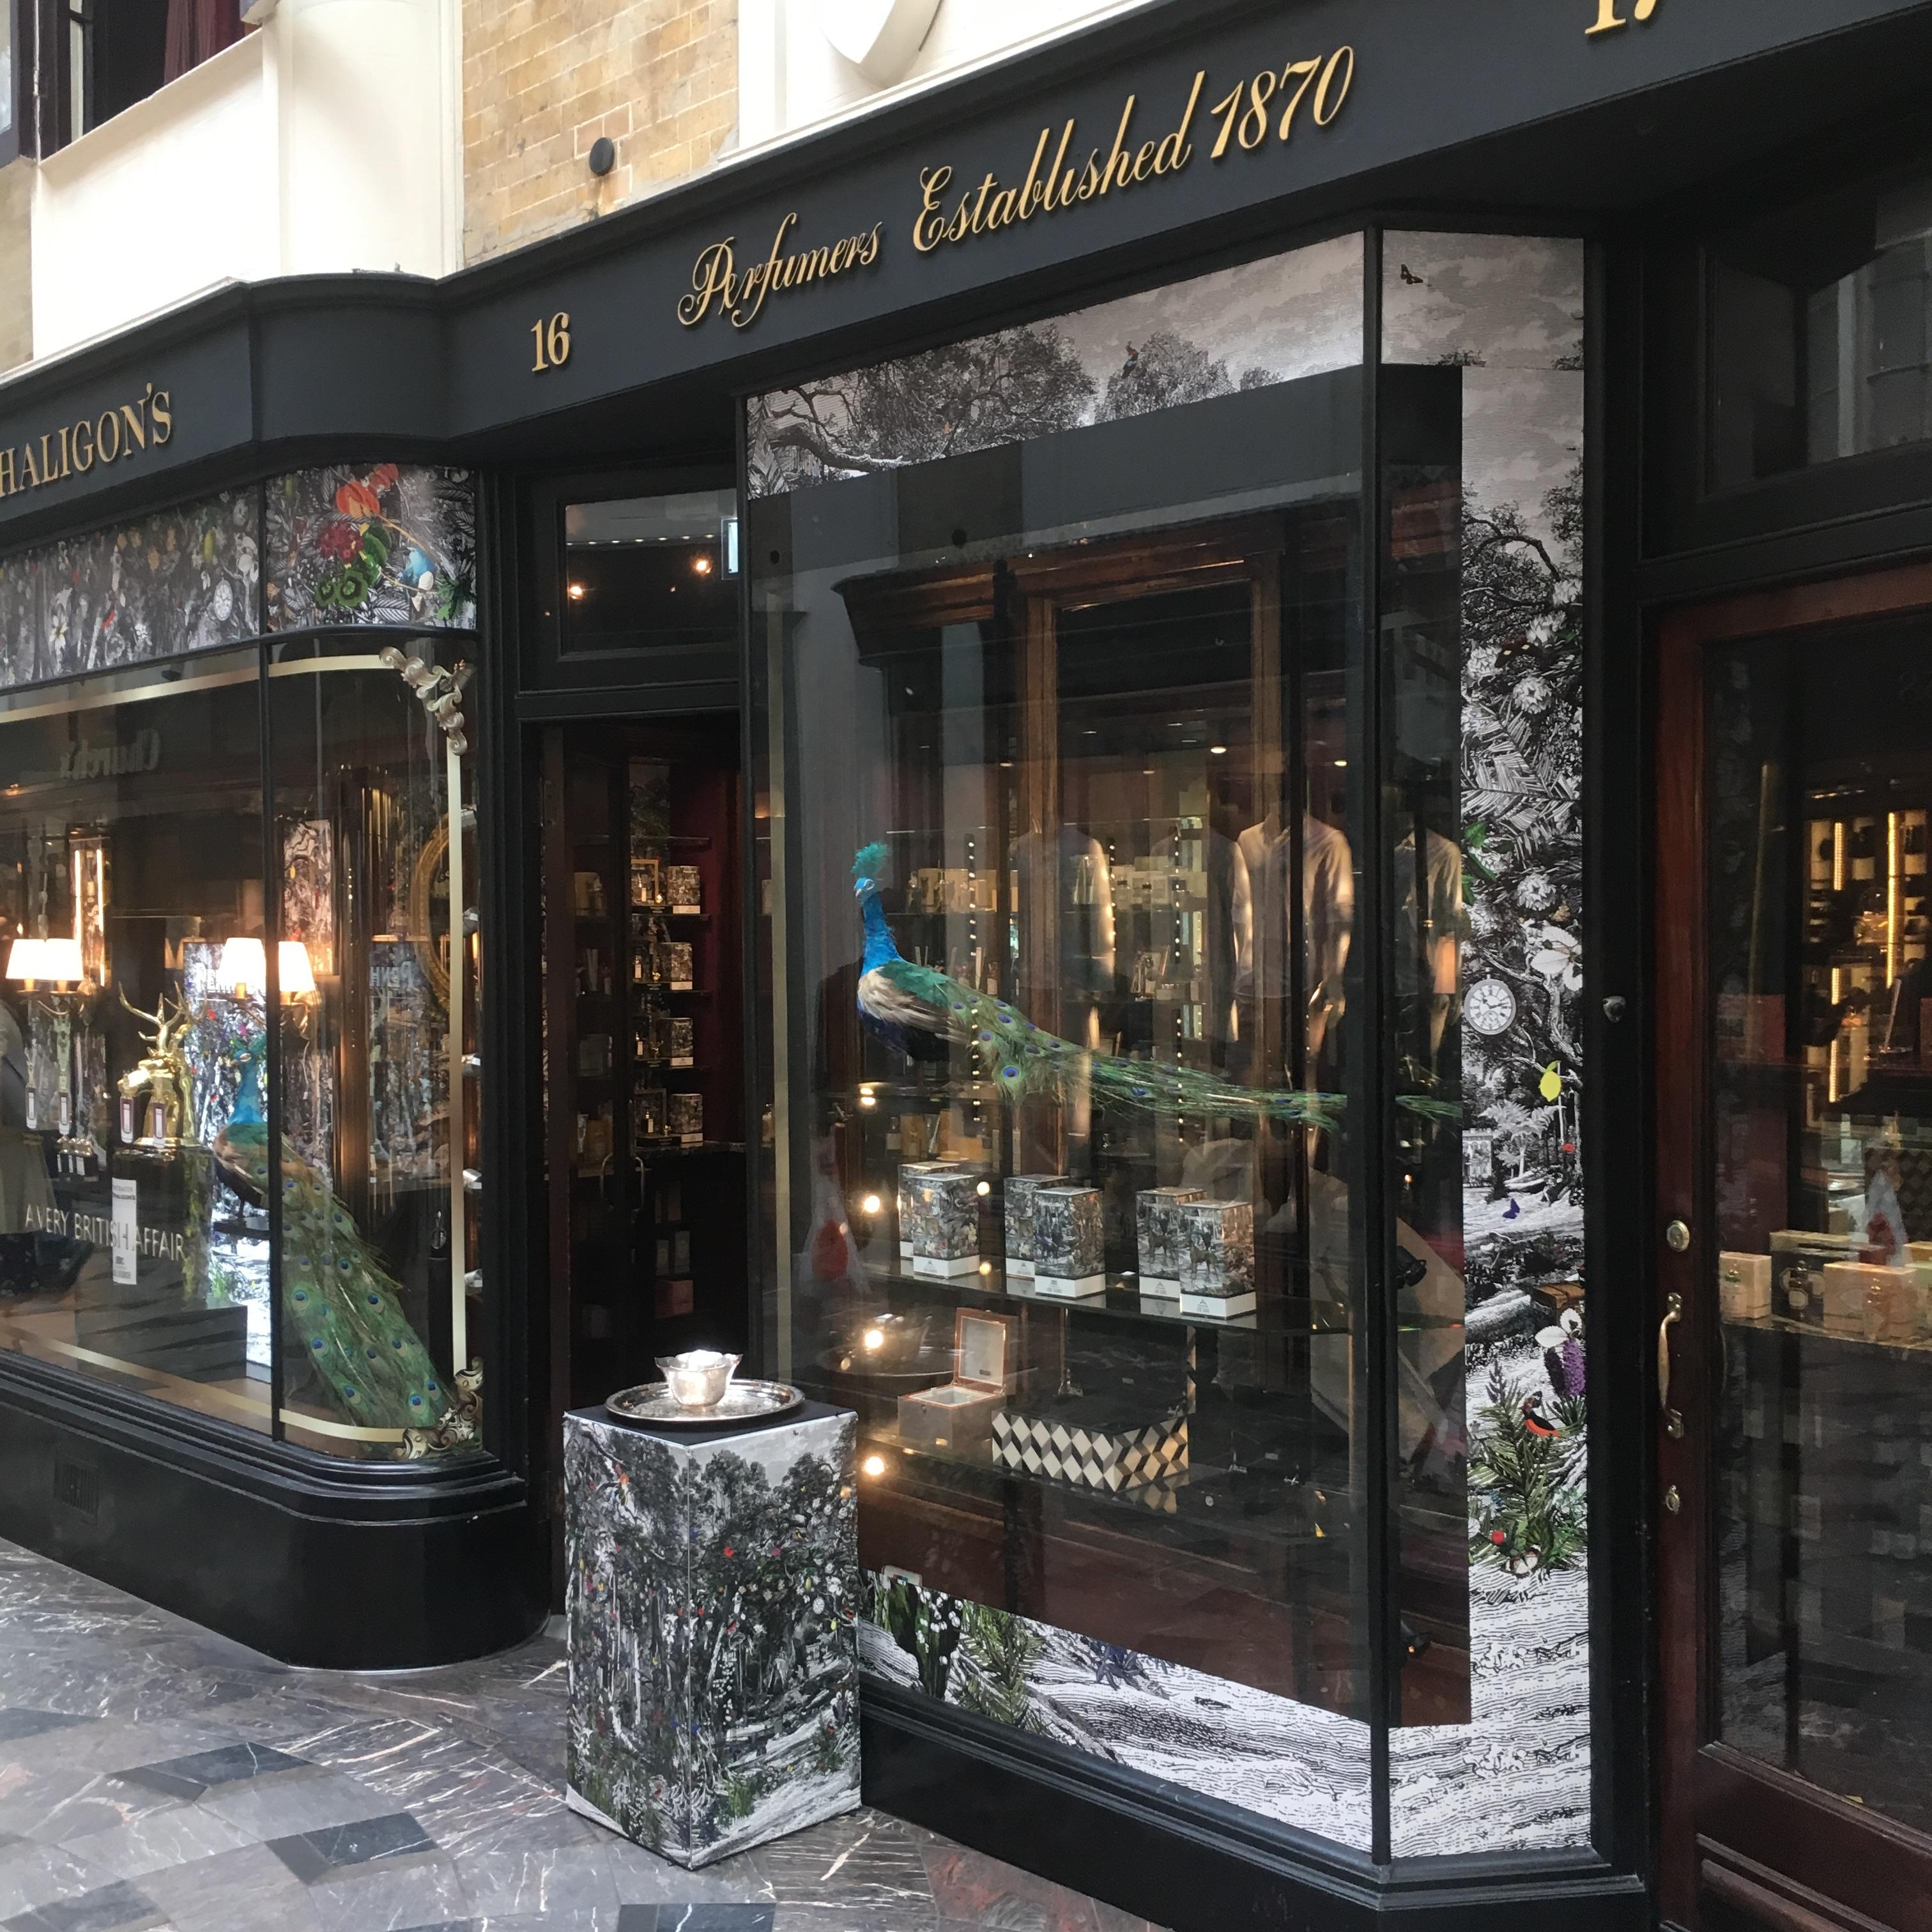 Penhaligon's perfumery in London, Burlington Arcade